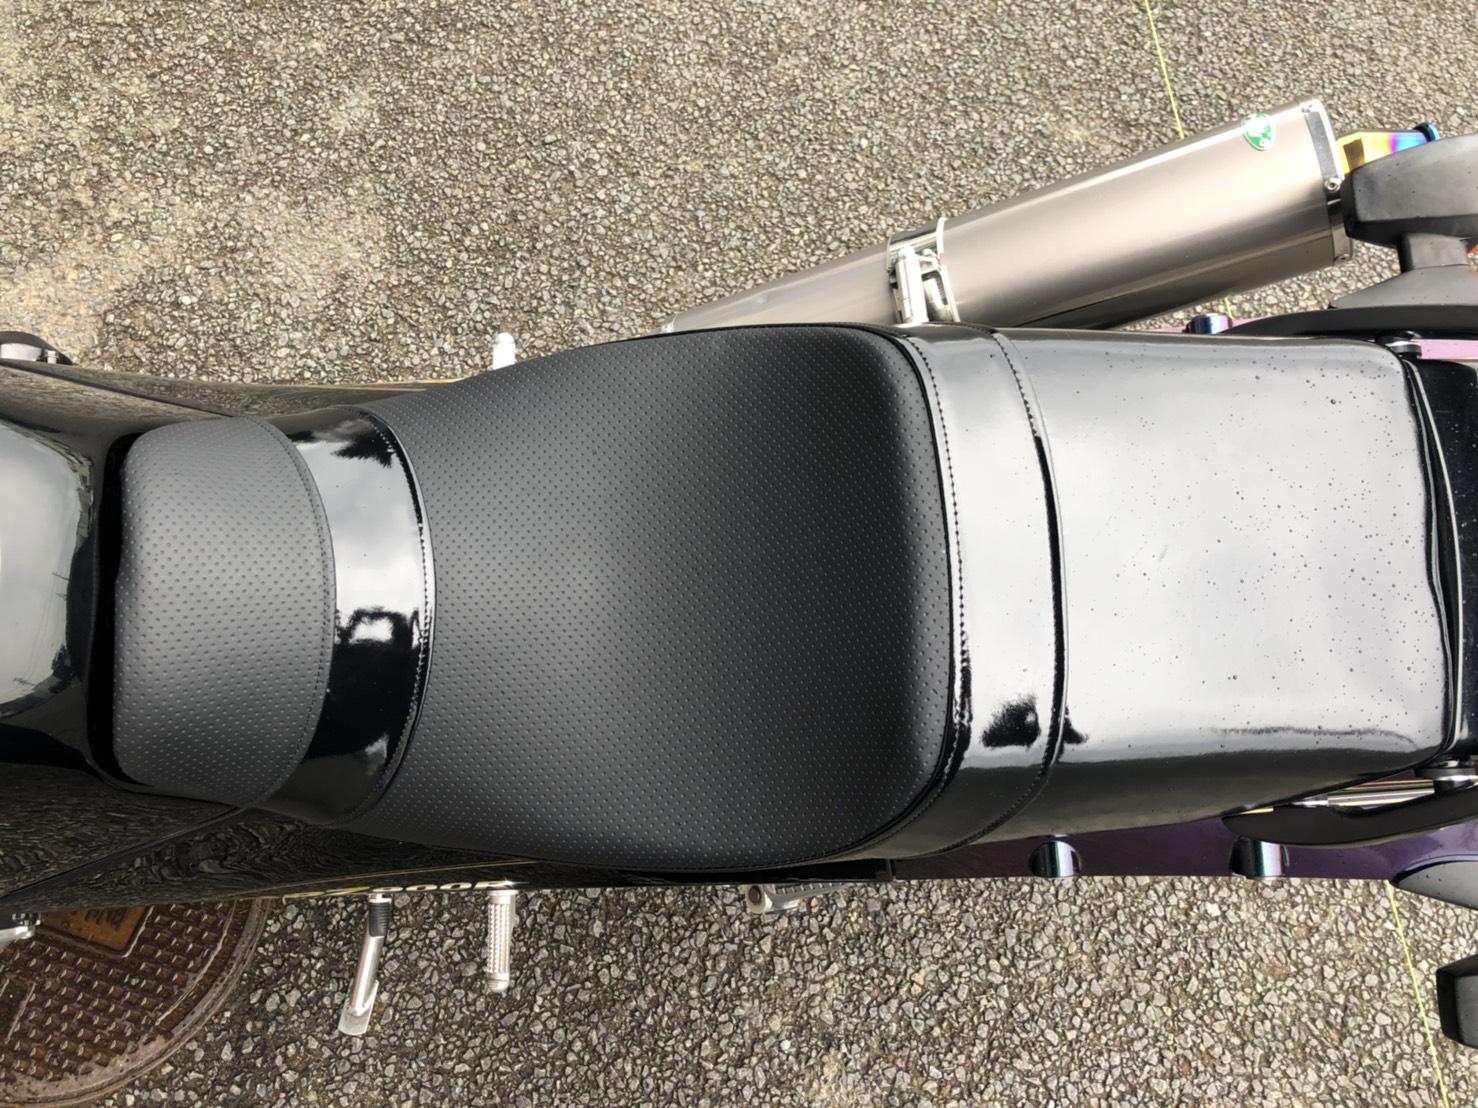 GPZ900Rシート張替え